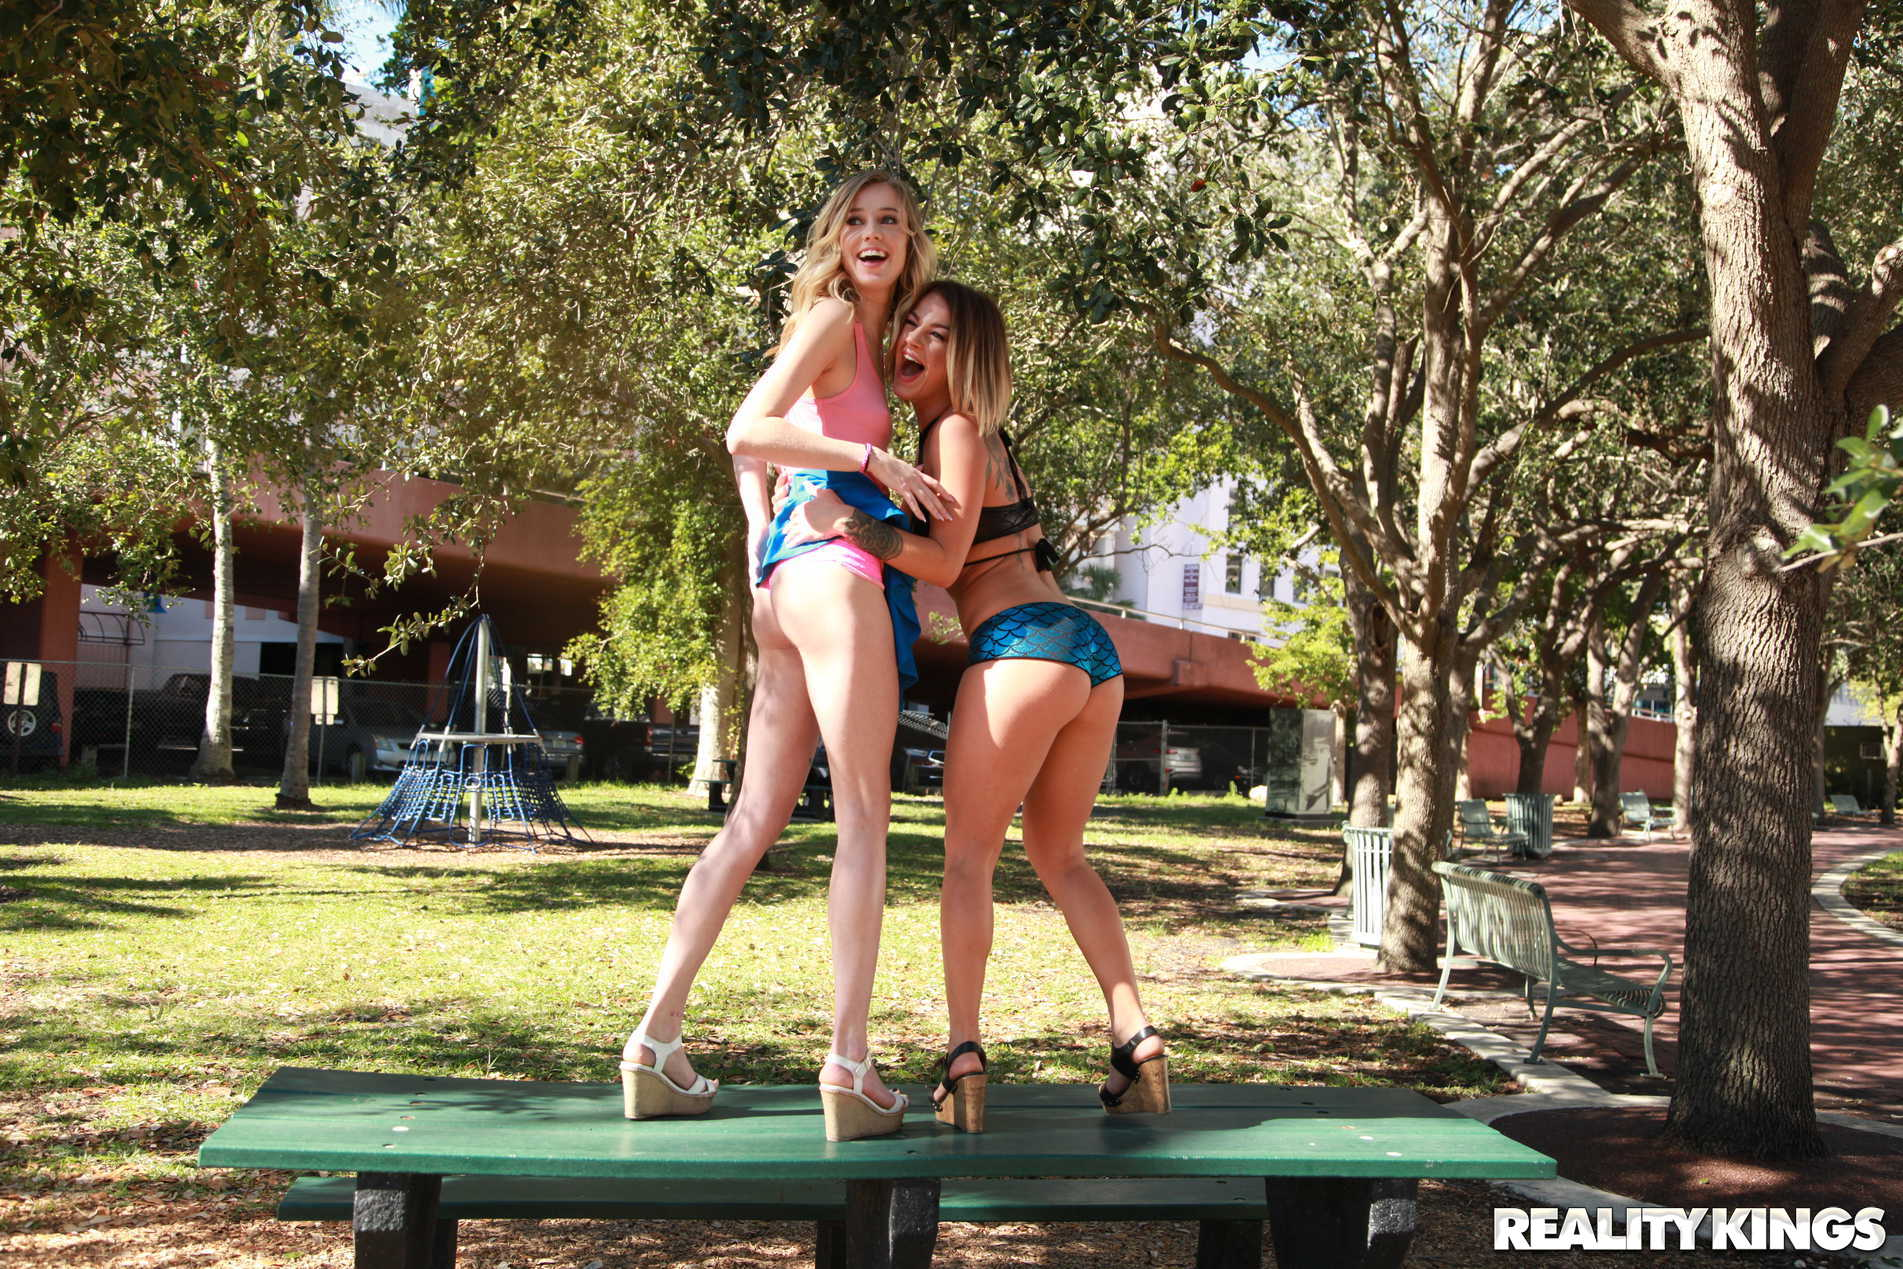 Reality Kings 'Daring Dames' starring Haley Reed (Photo 80)